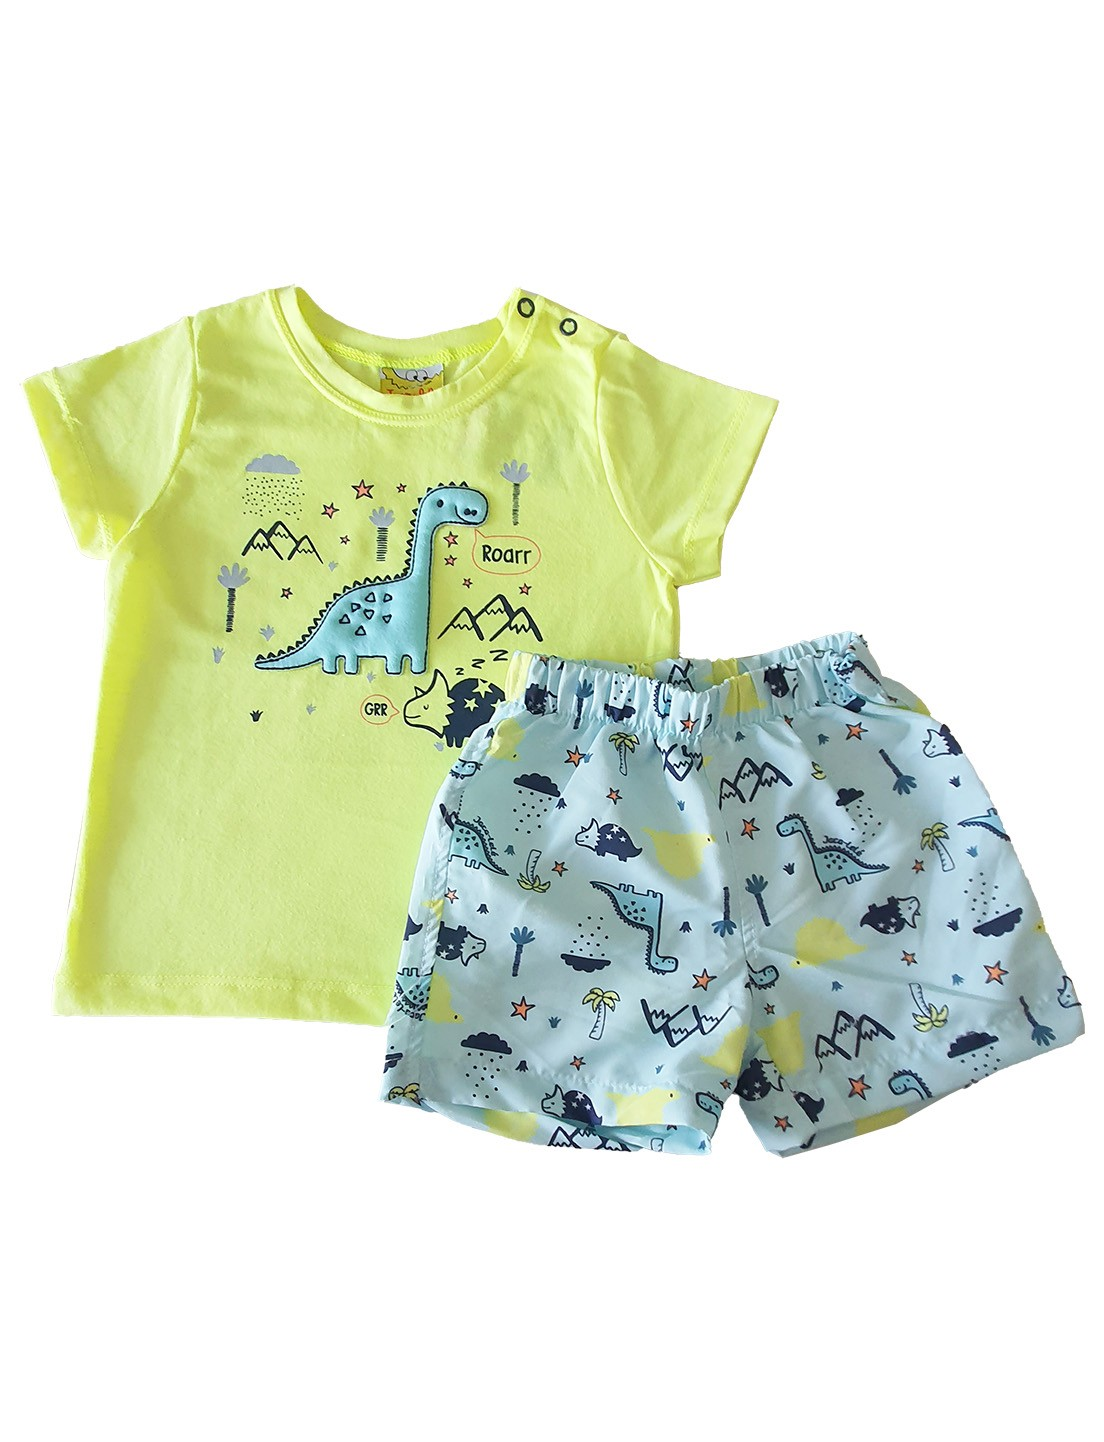 Conjunto Infantil Camiseta e Shorts JACA-LELÉ Dino Amarelo e Mescla